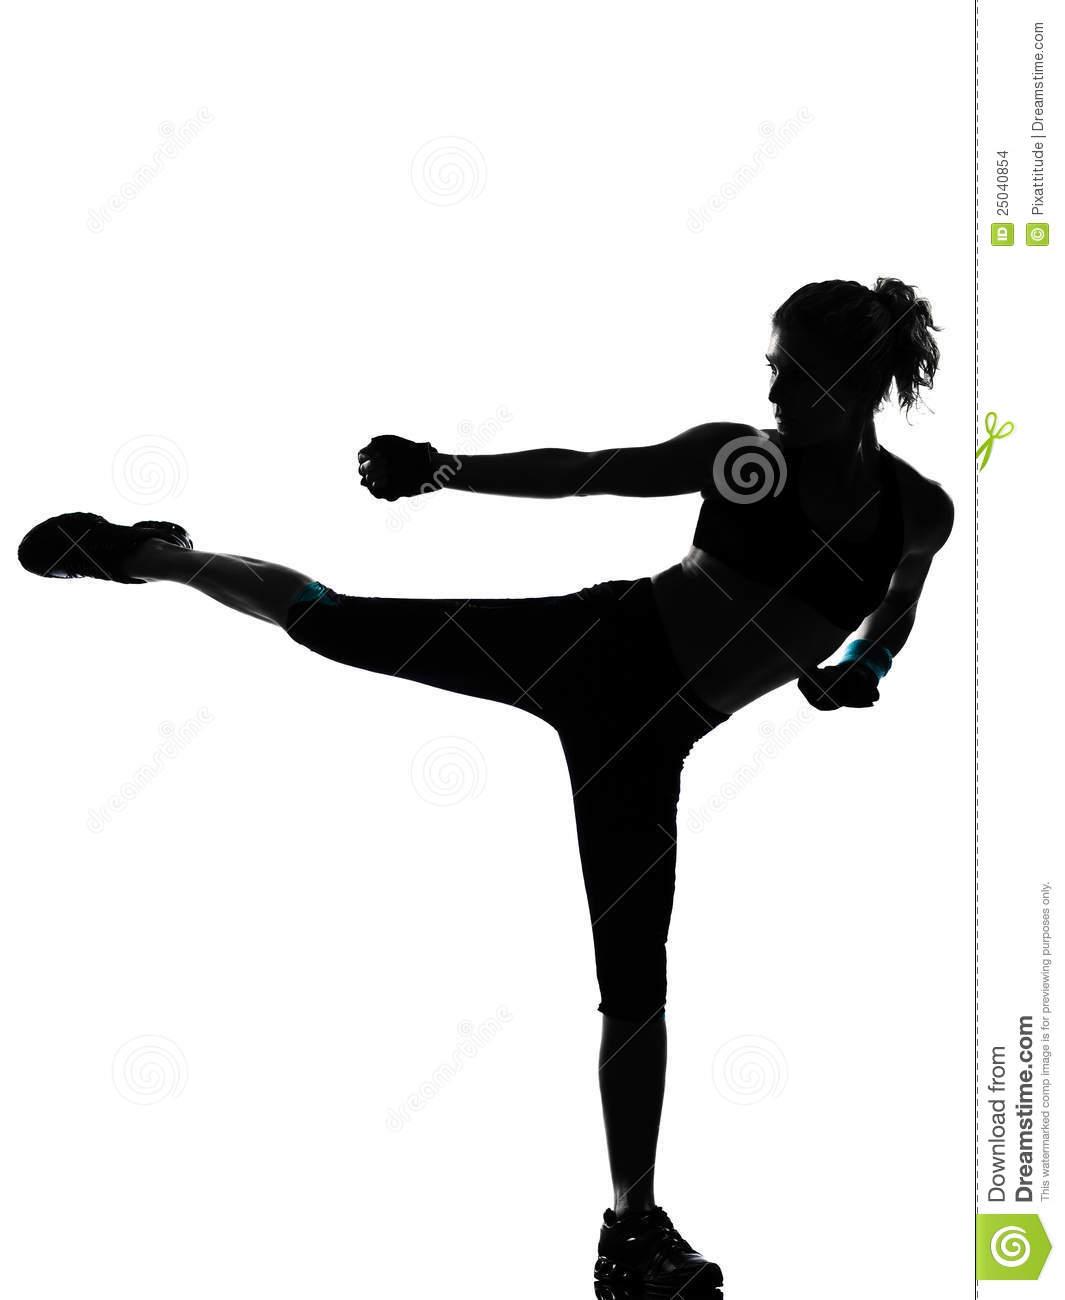 Kickboxing Woman Silhouette.